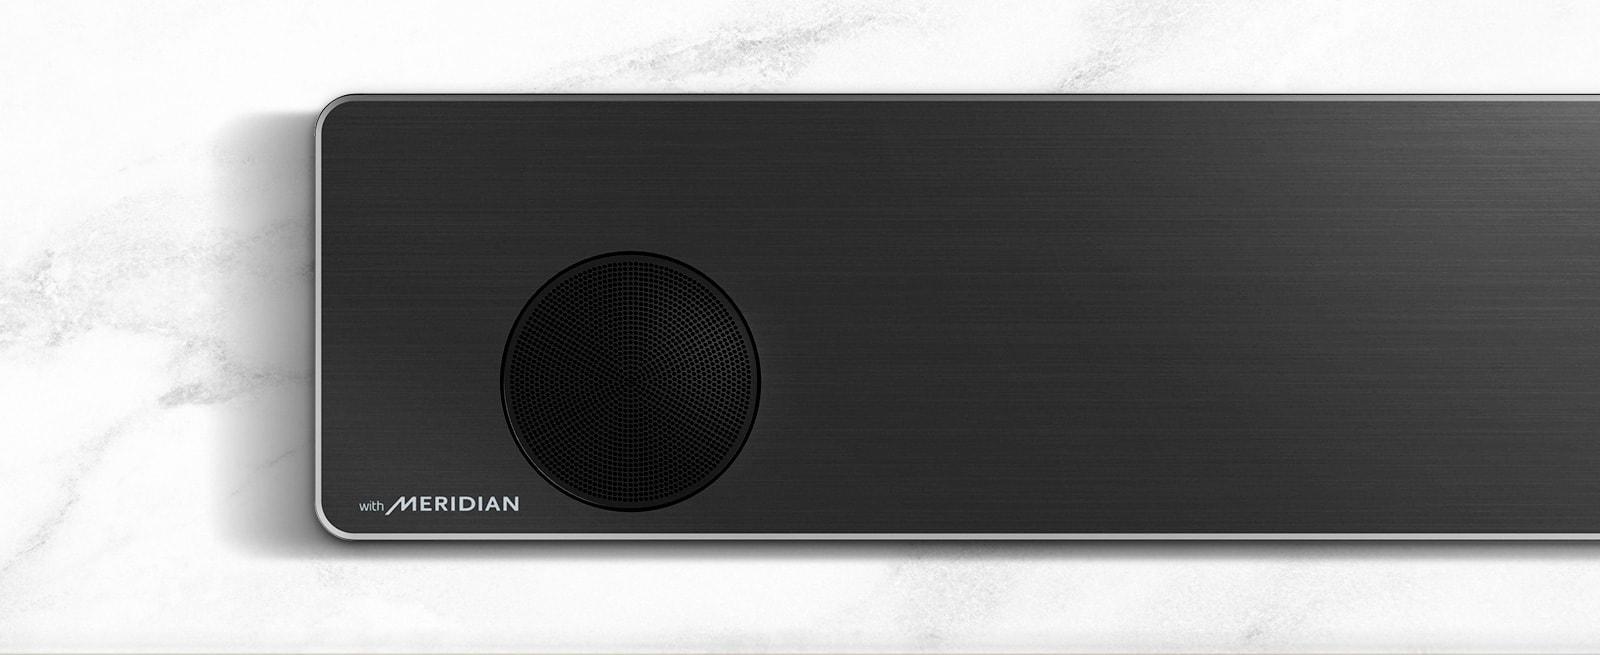 Close-up of the left side of LG Soundbar with Meridian logo on the bottom left corner.